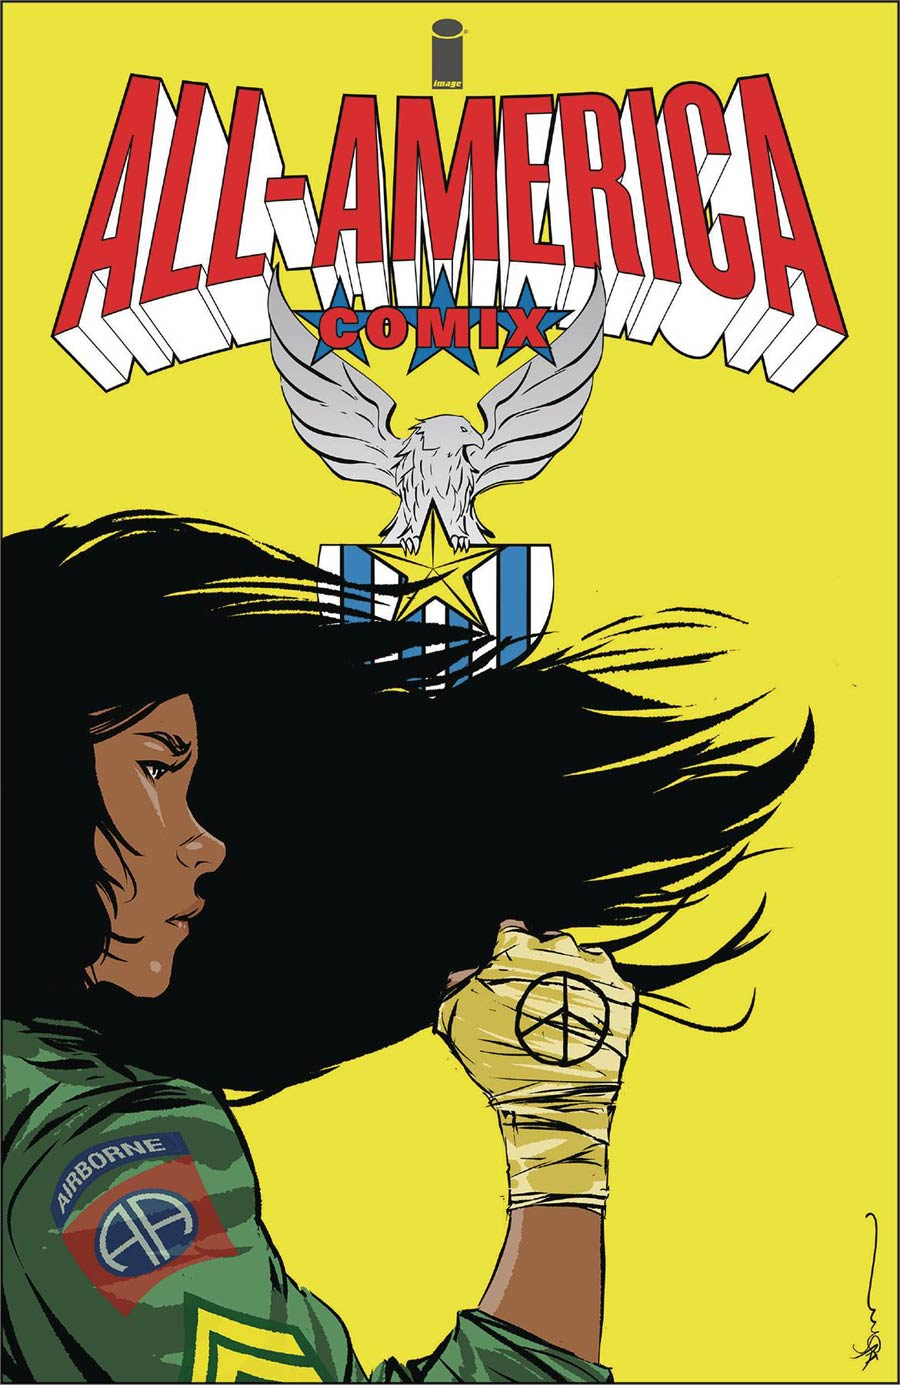 All-American Comix #1